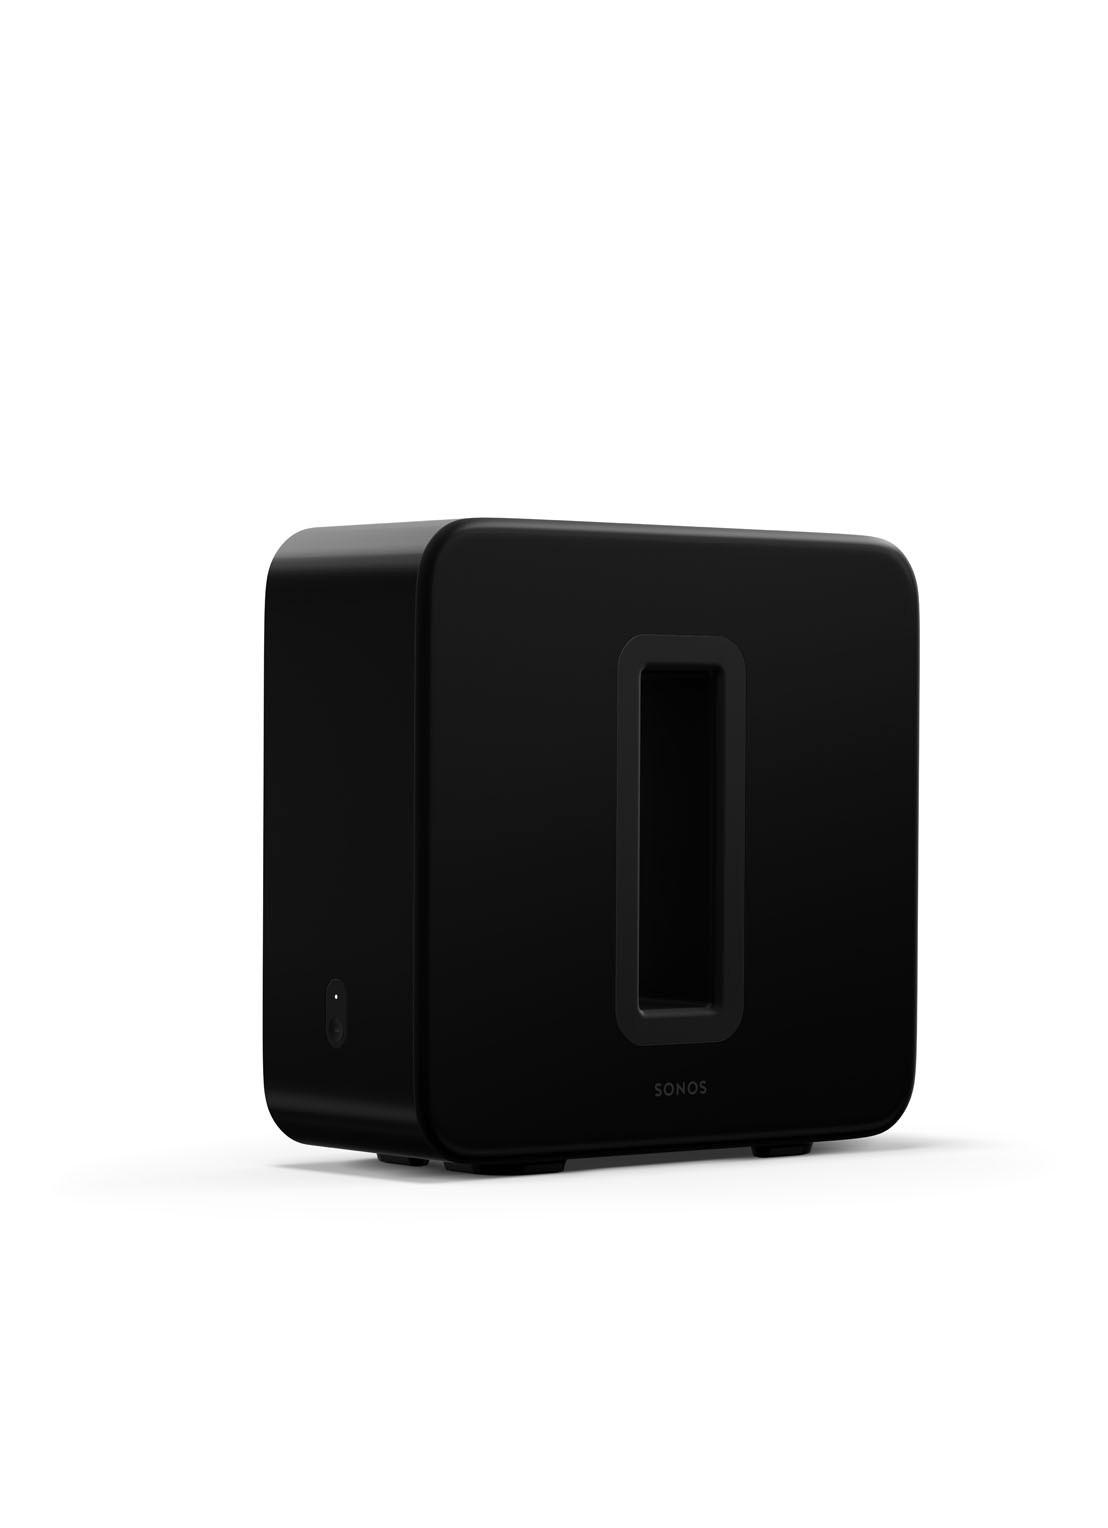 Sonos SUB Gen3subwoofer wifi